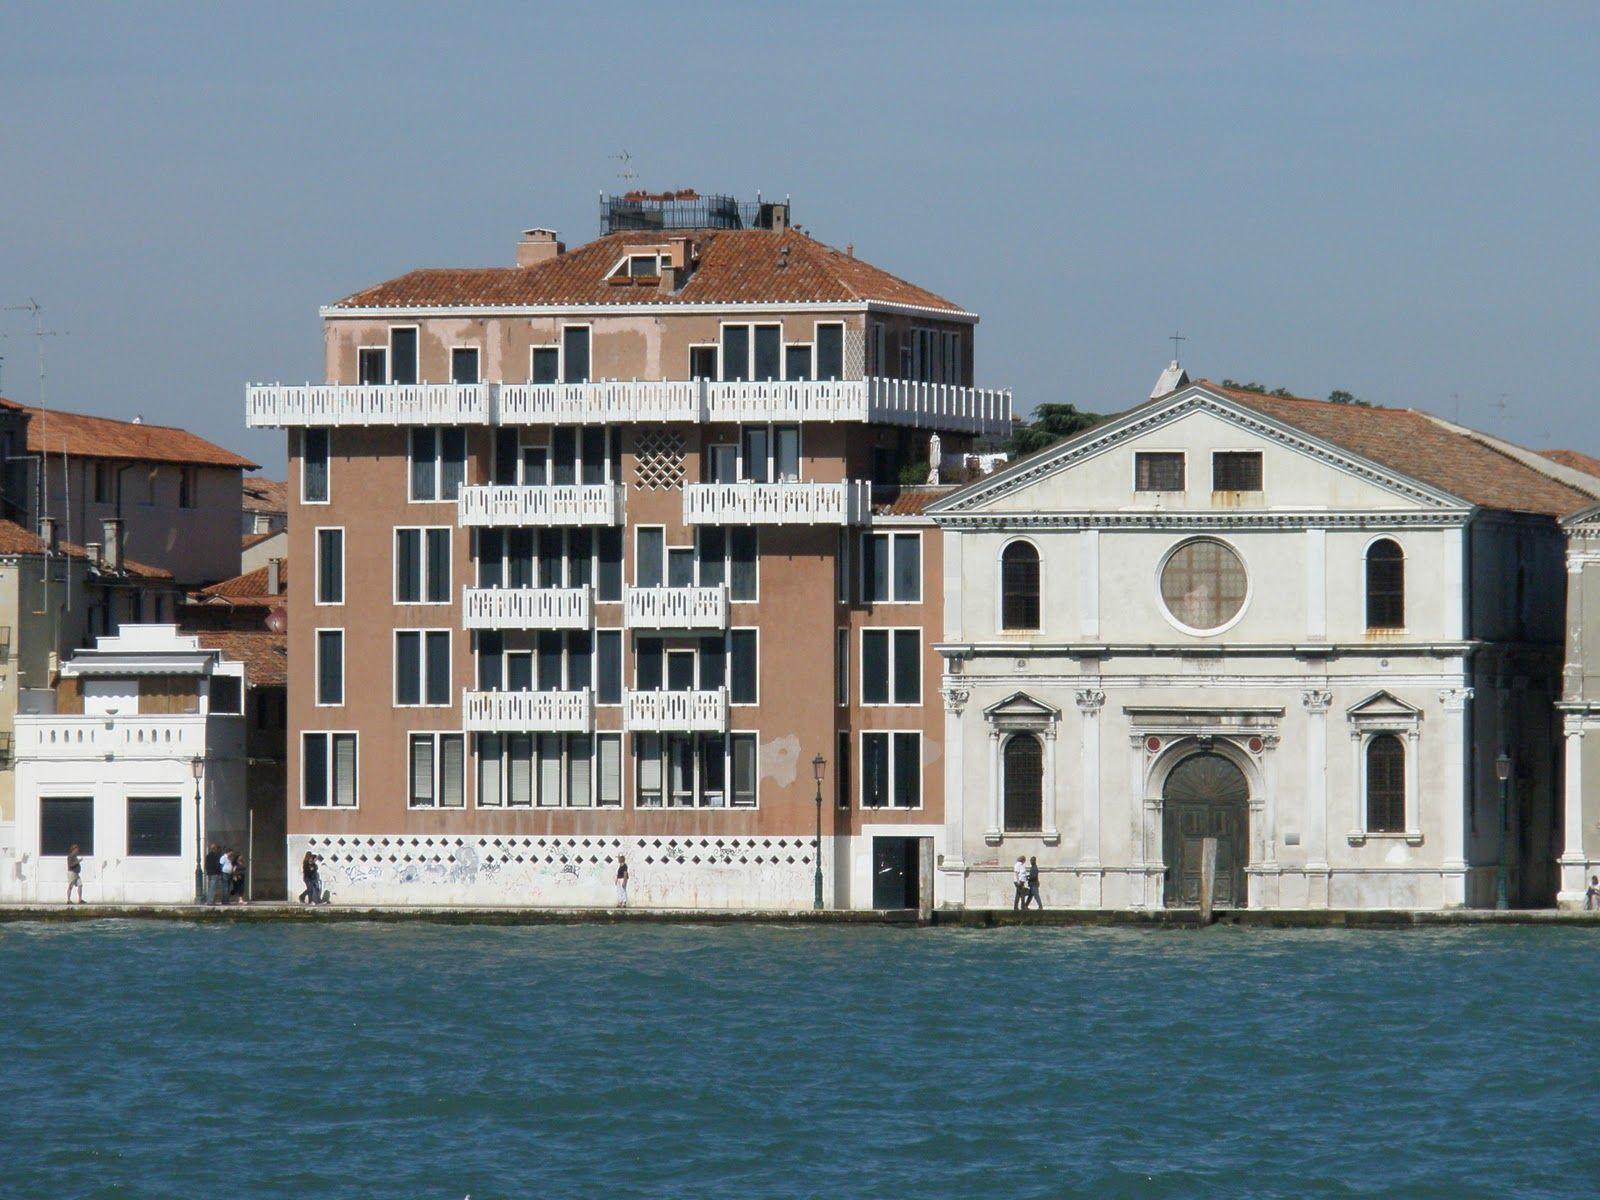 Ignazio gardella venezia google architettura for Casa moderna venezia